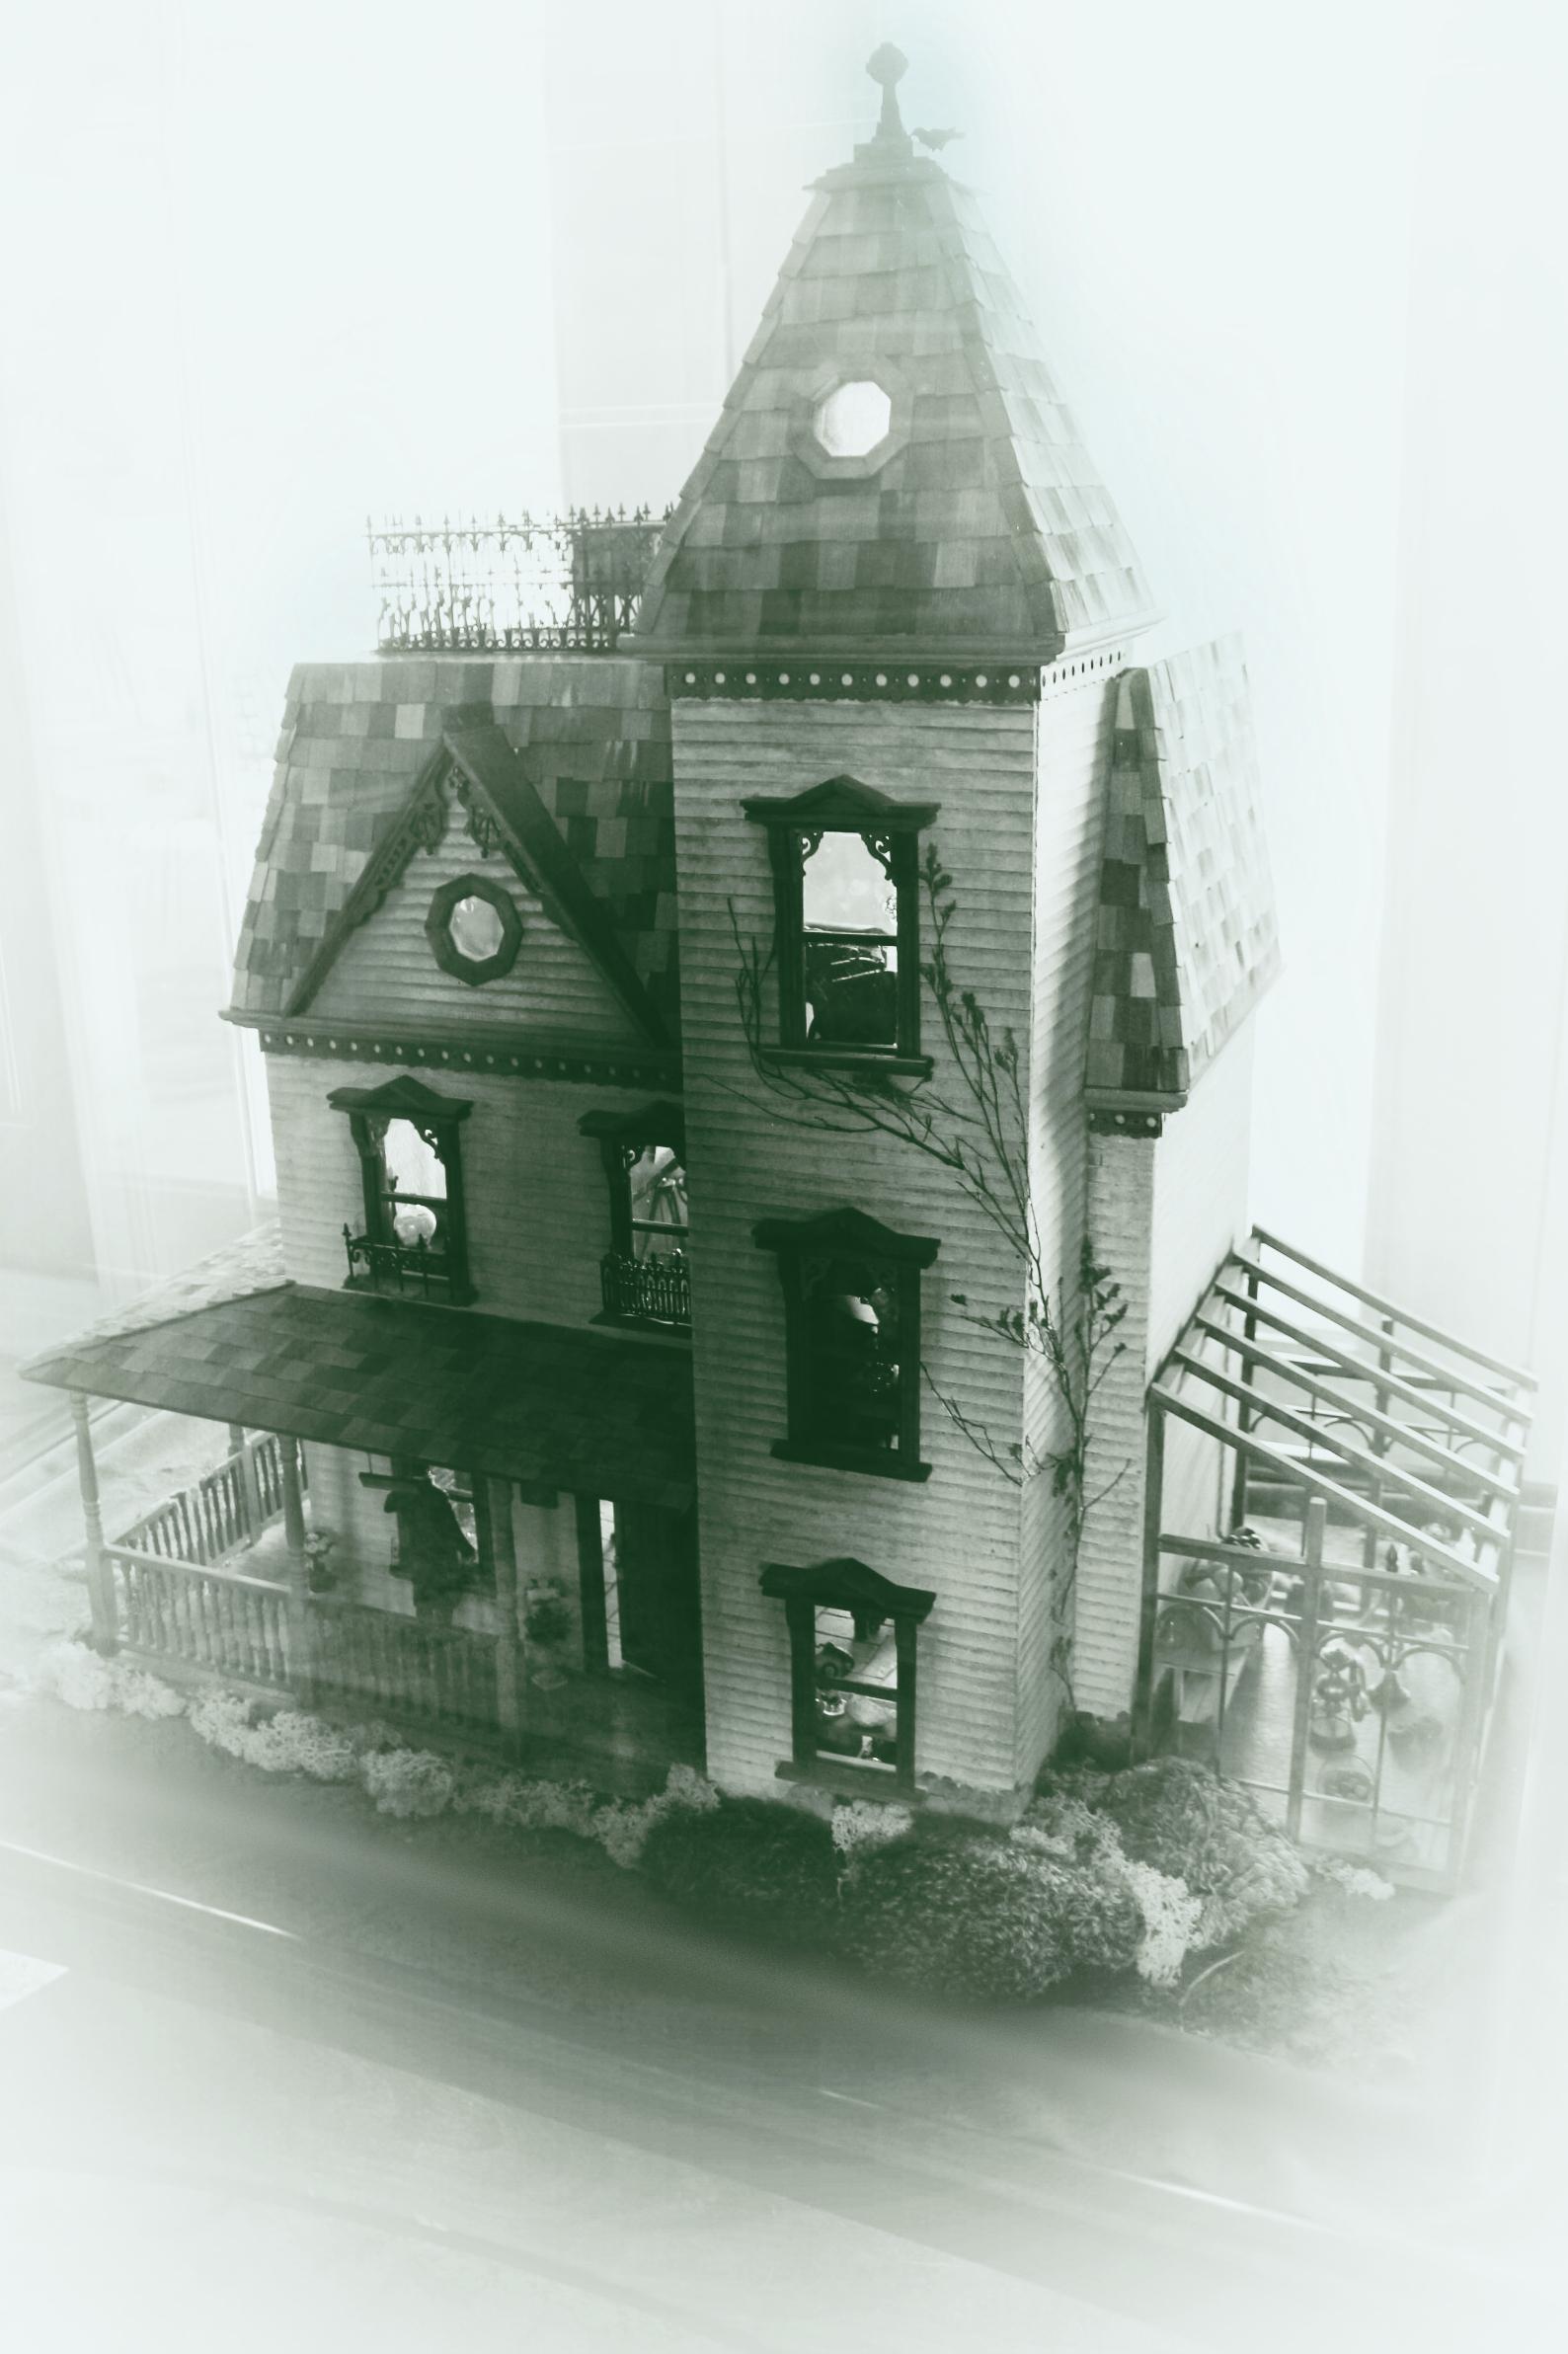 Dollhouse Miniature 1:24 Scale Corn-on-the-Cob 3 pieces